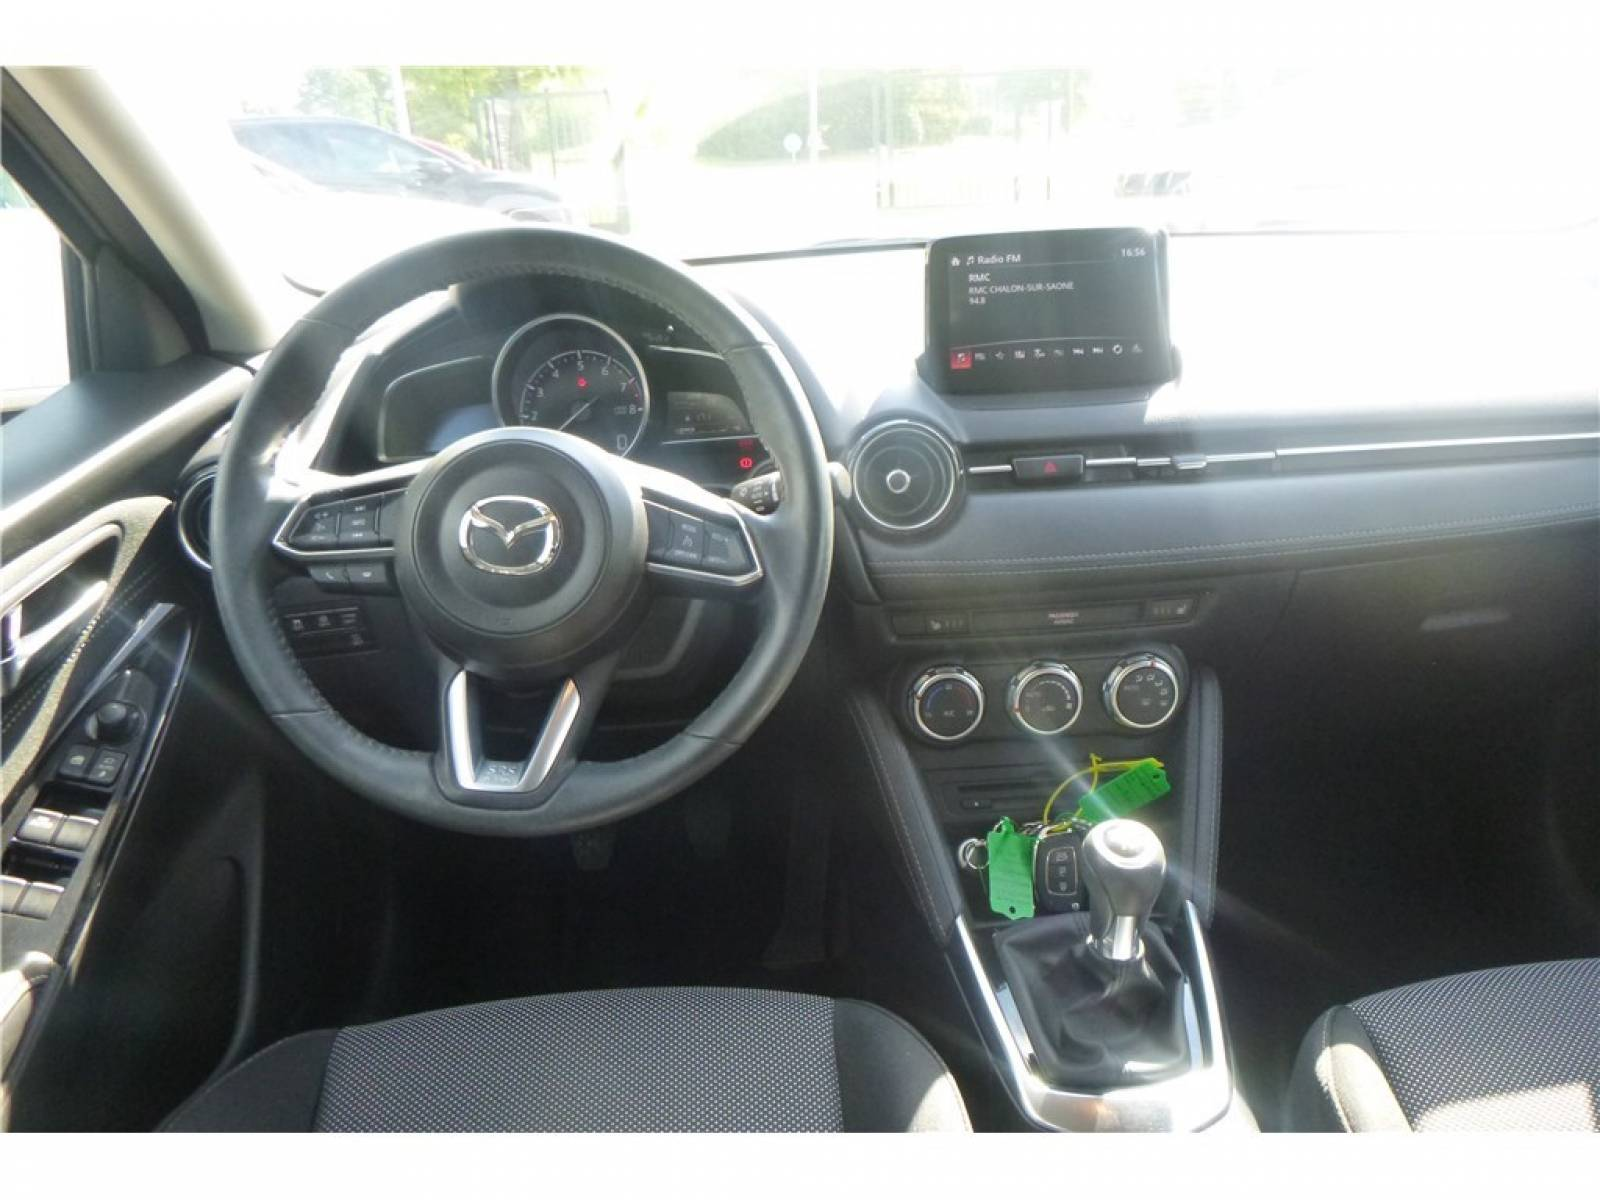 MAZDA Mazda2 1.5L SKYACTIV-G 90ch - véhicule d'occasion - Groupe Guillet - Chalon Automobiles - 71100 - Chalon-sur-Saône - 9